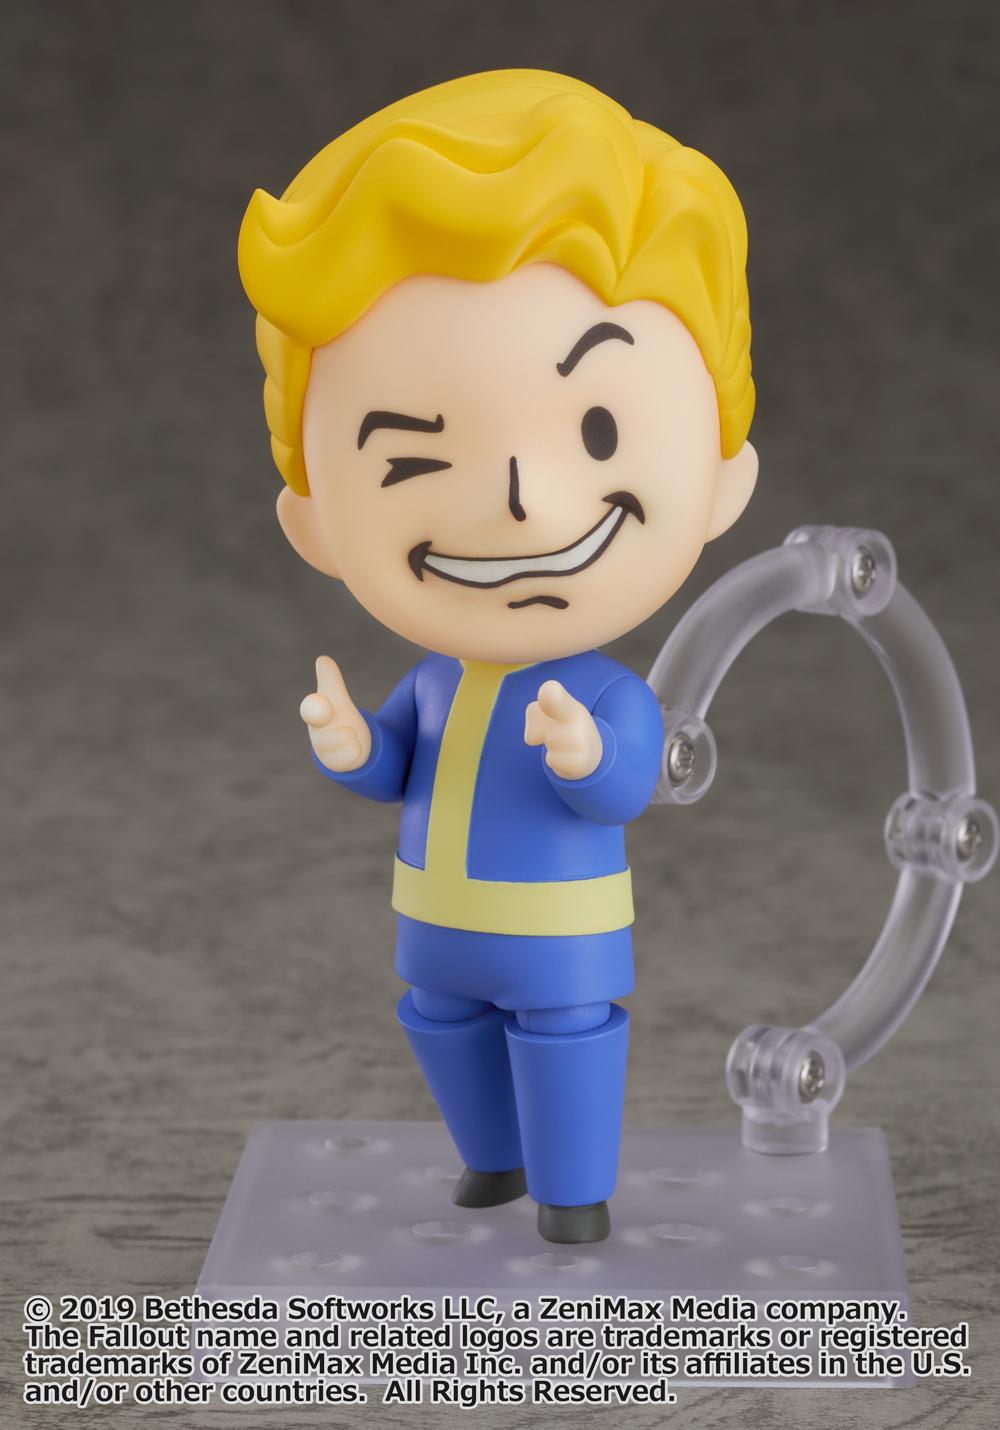 Fallout – Vault Boy Nendoroid